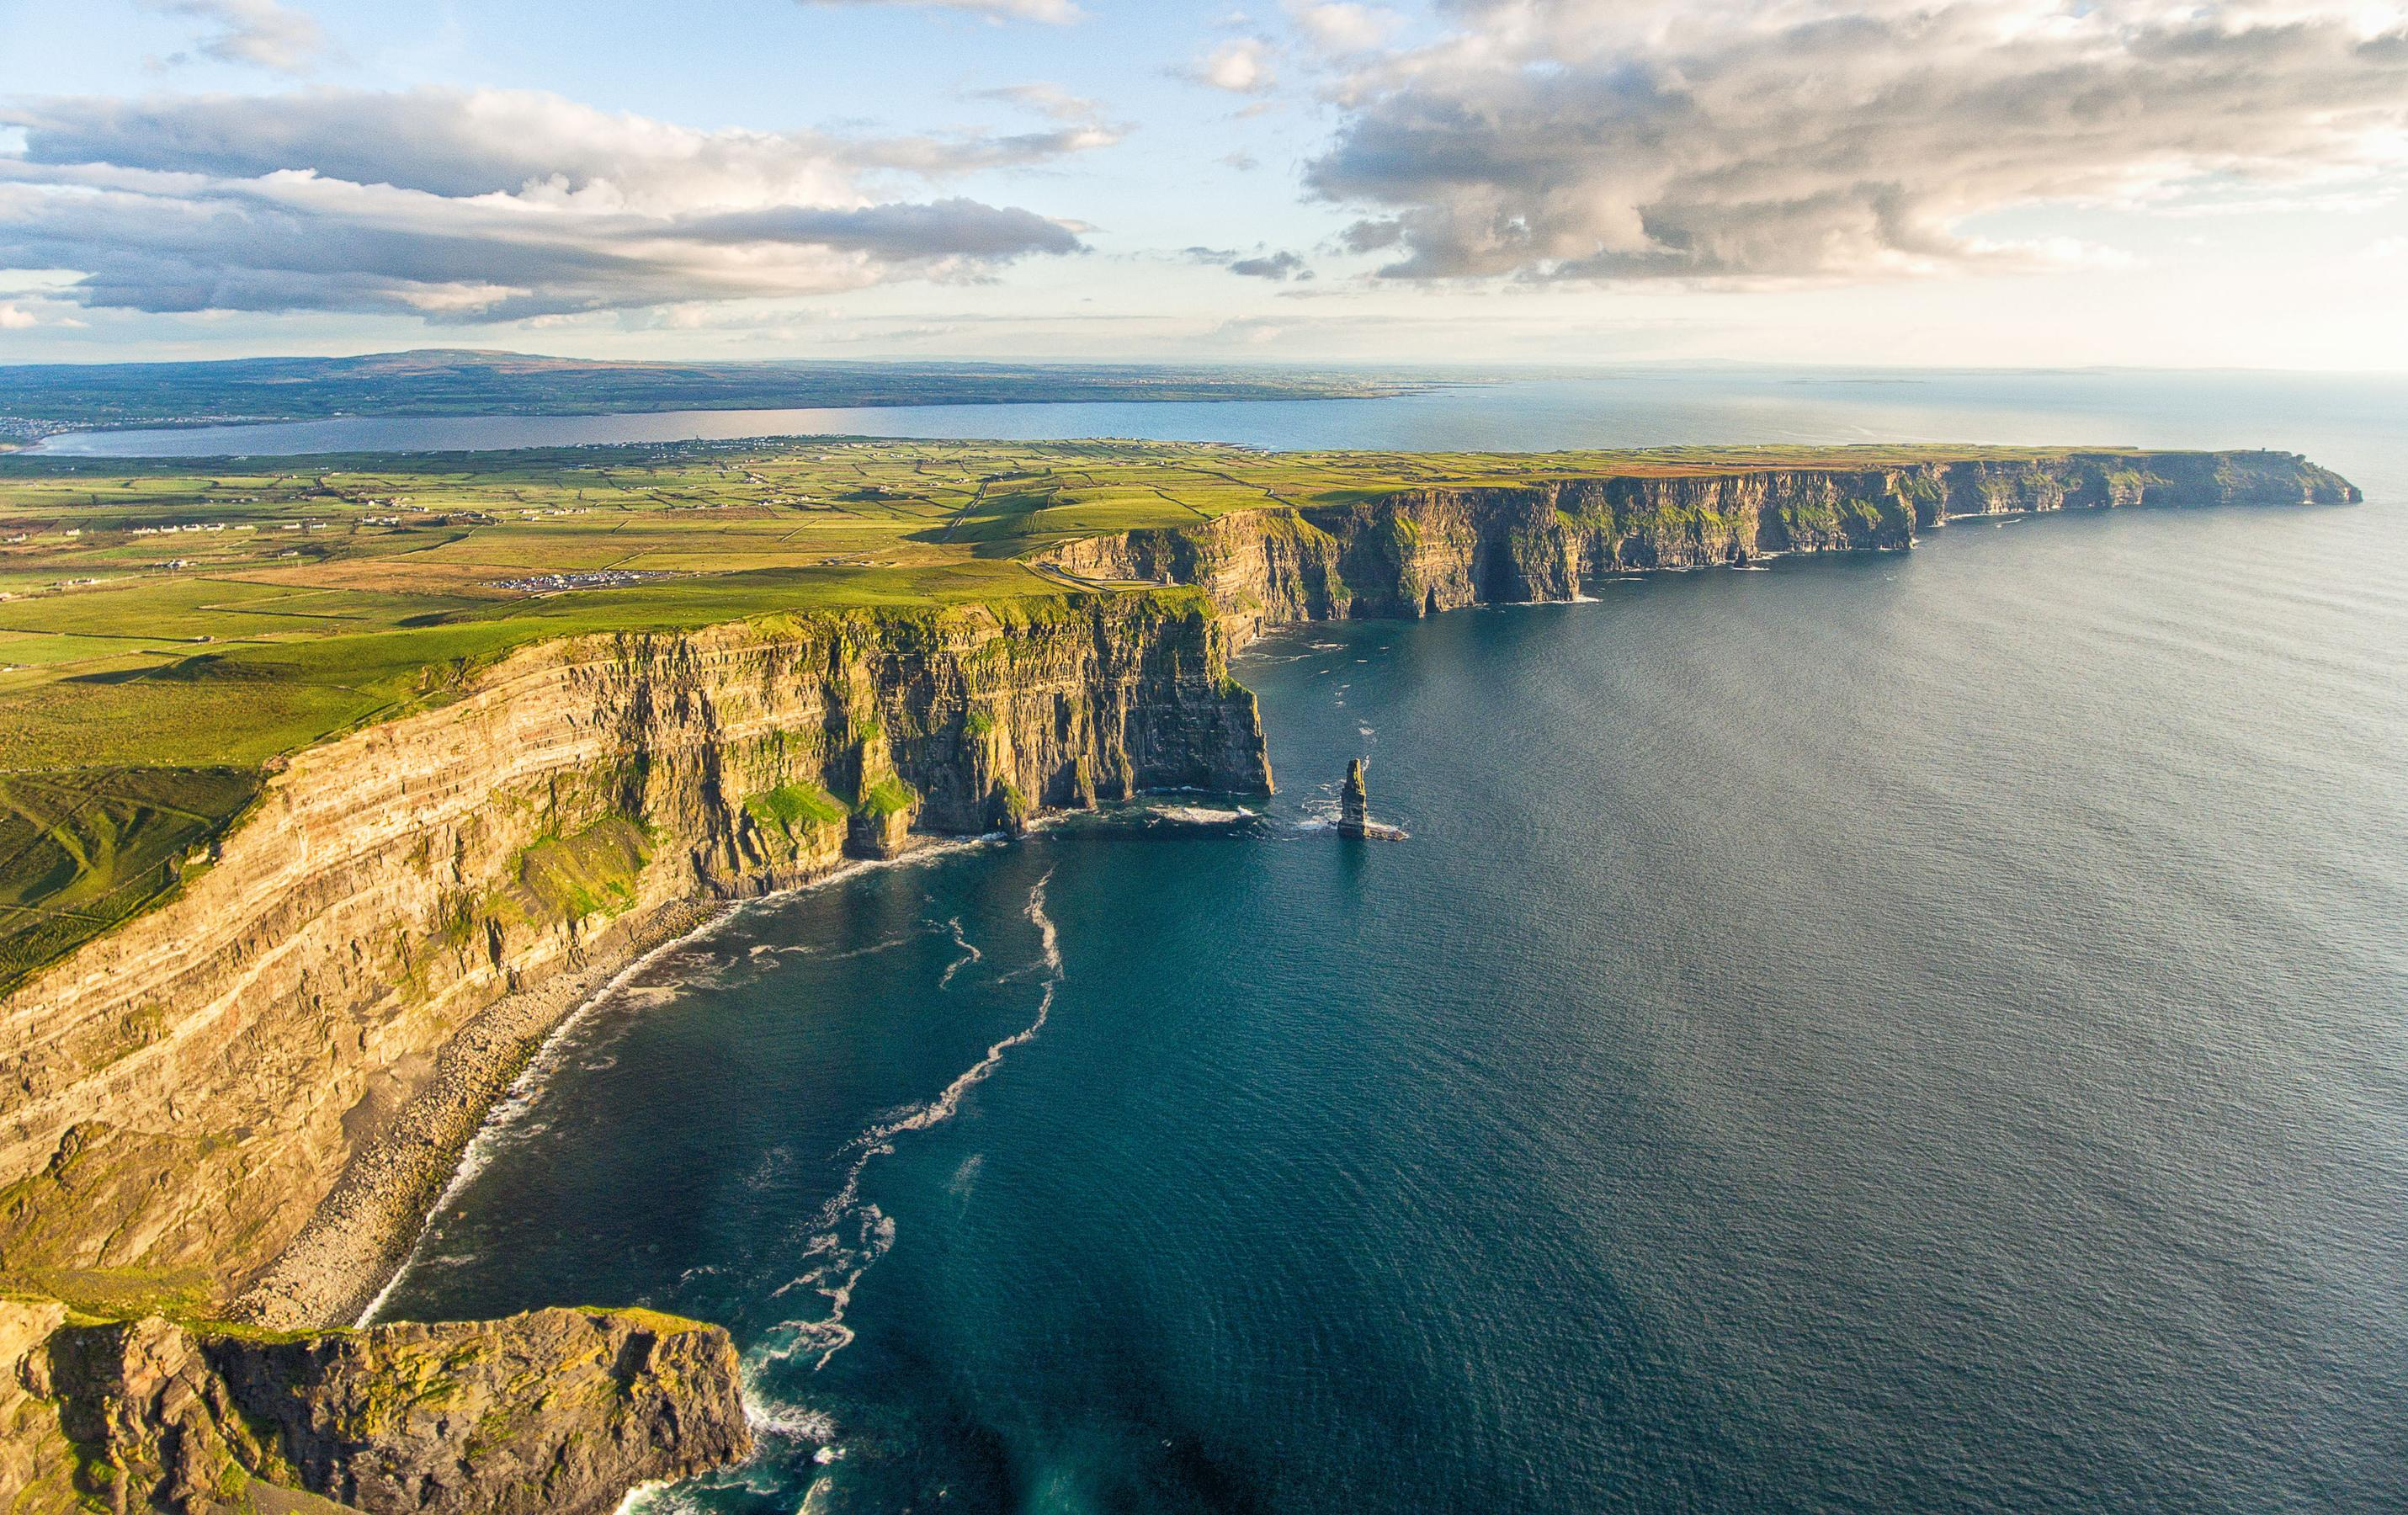 Cliffs of Moher, Ireland зурган илэрцүүд